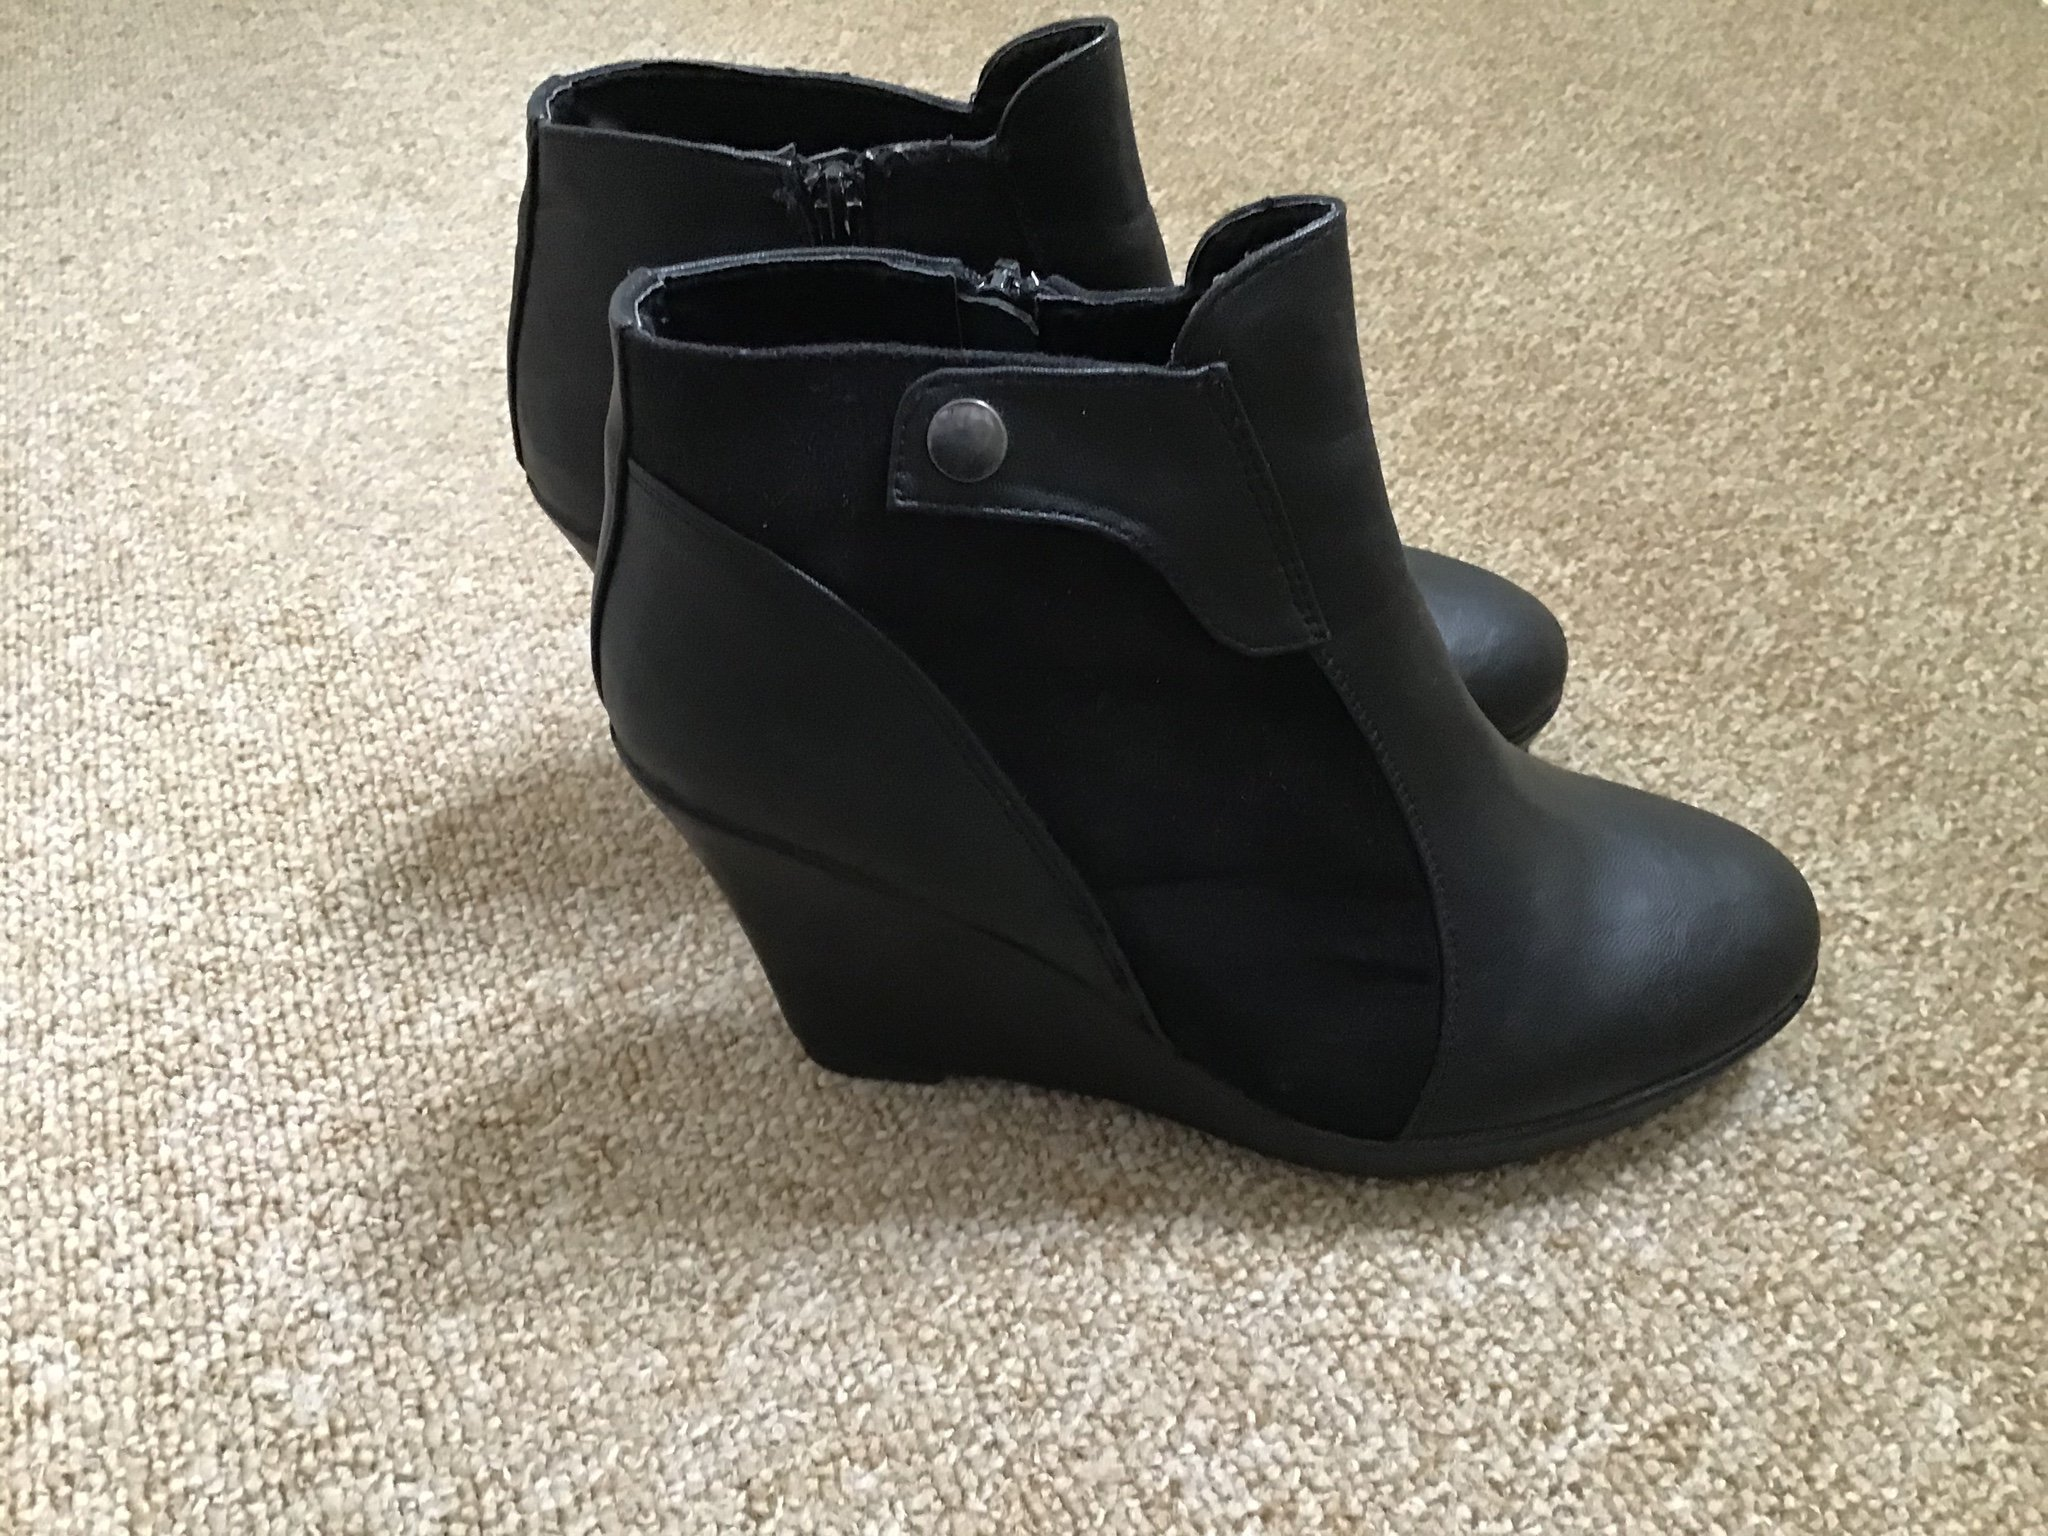 Känga sko, dam, storlek 37, svart skinn och det.. (398394726